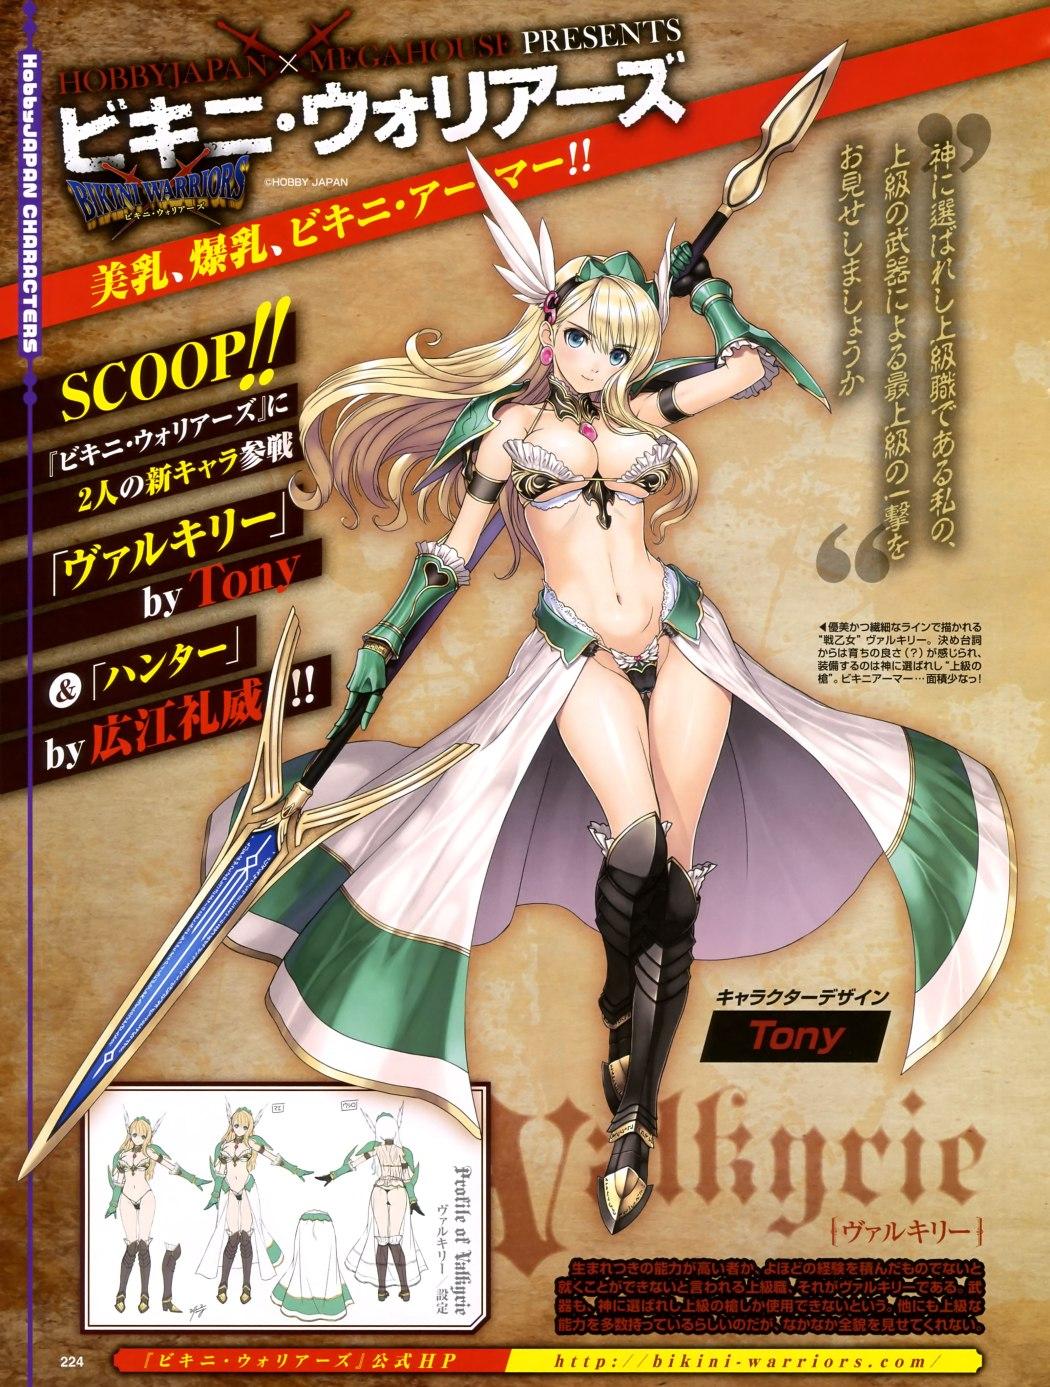 Bikini Warriors Anime Character Designs Have Major Plot 3